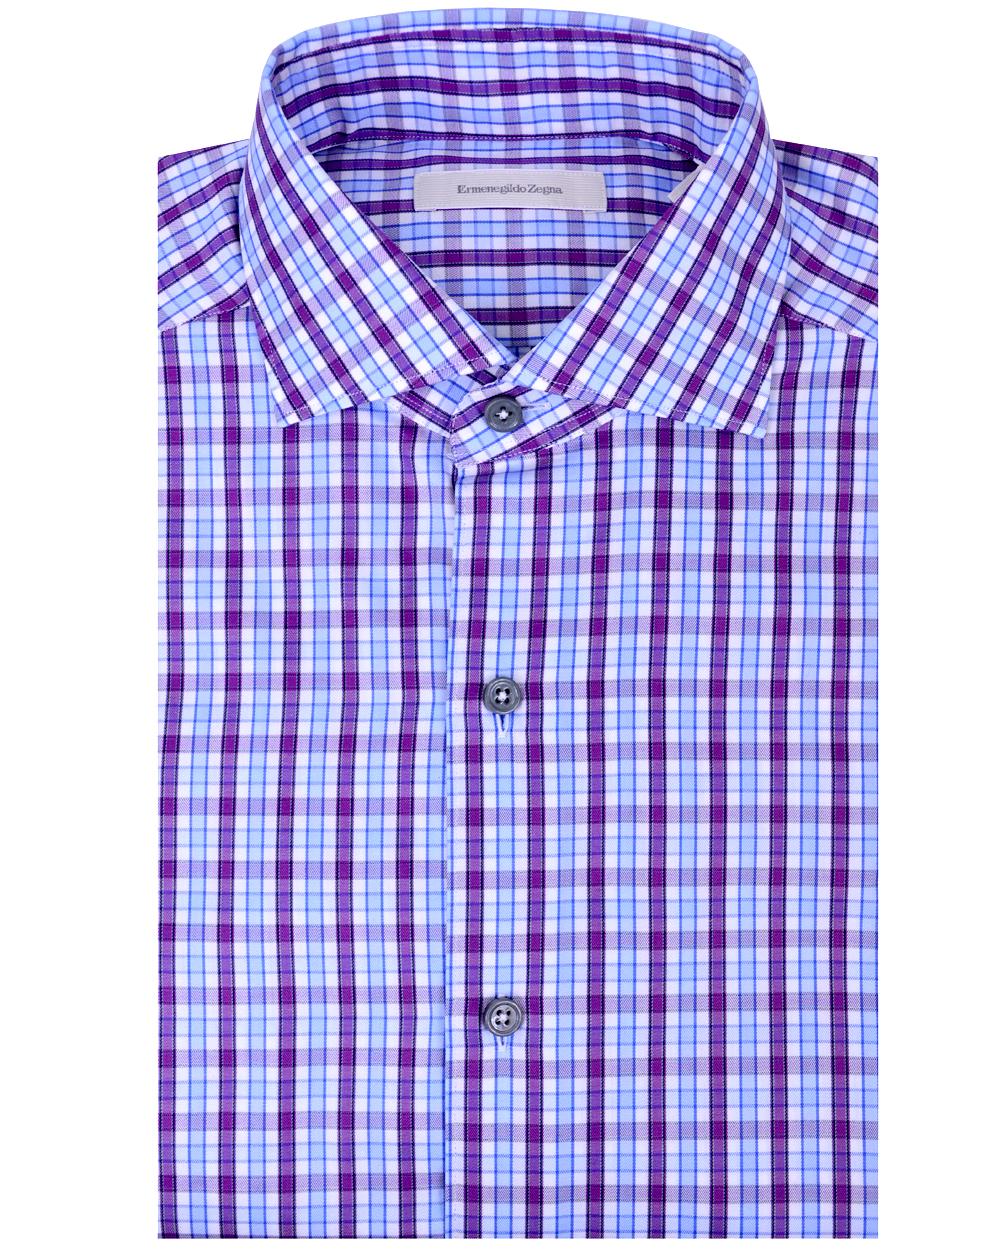 Ermenegildo Zegna Purple And Blue Plaid Dress Shirt In